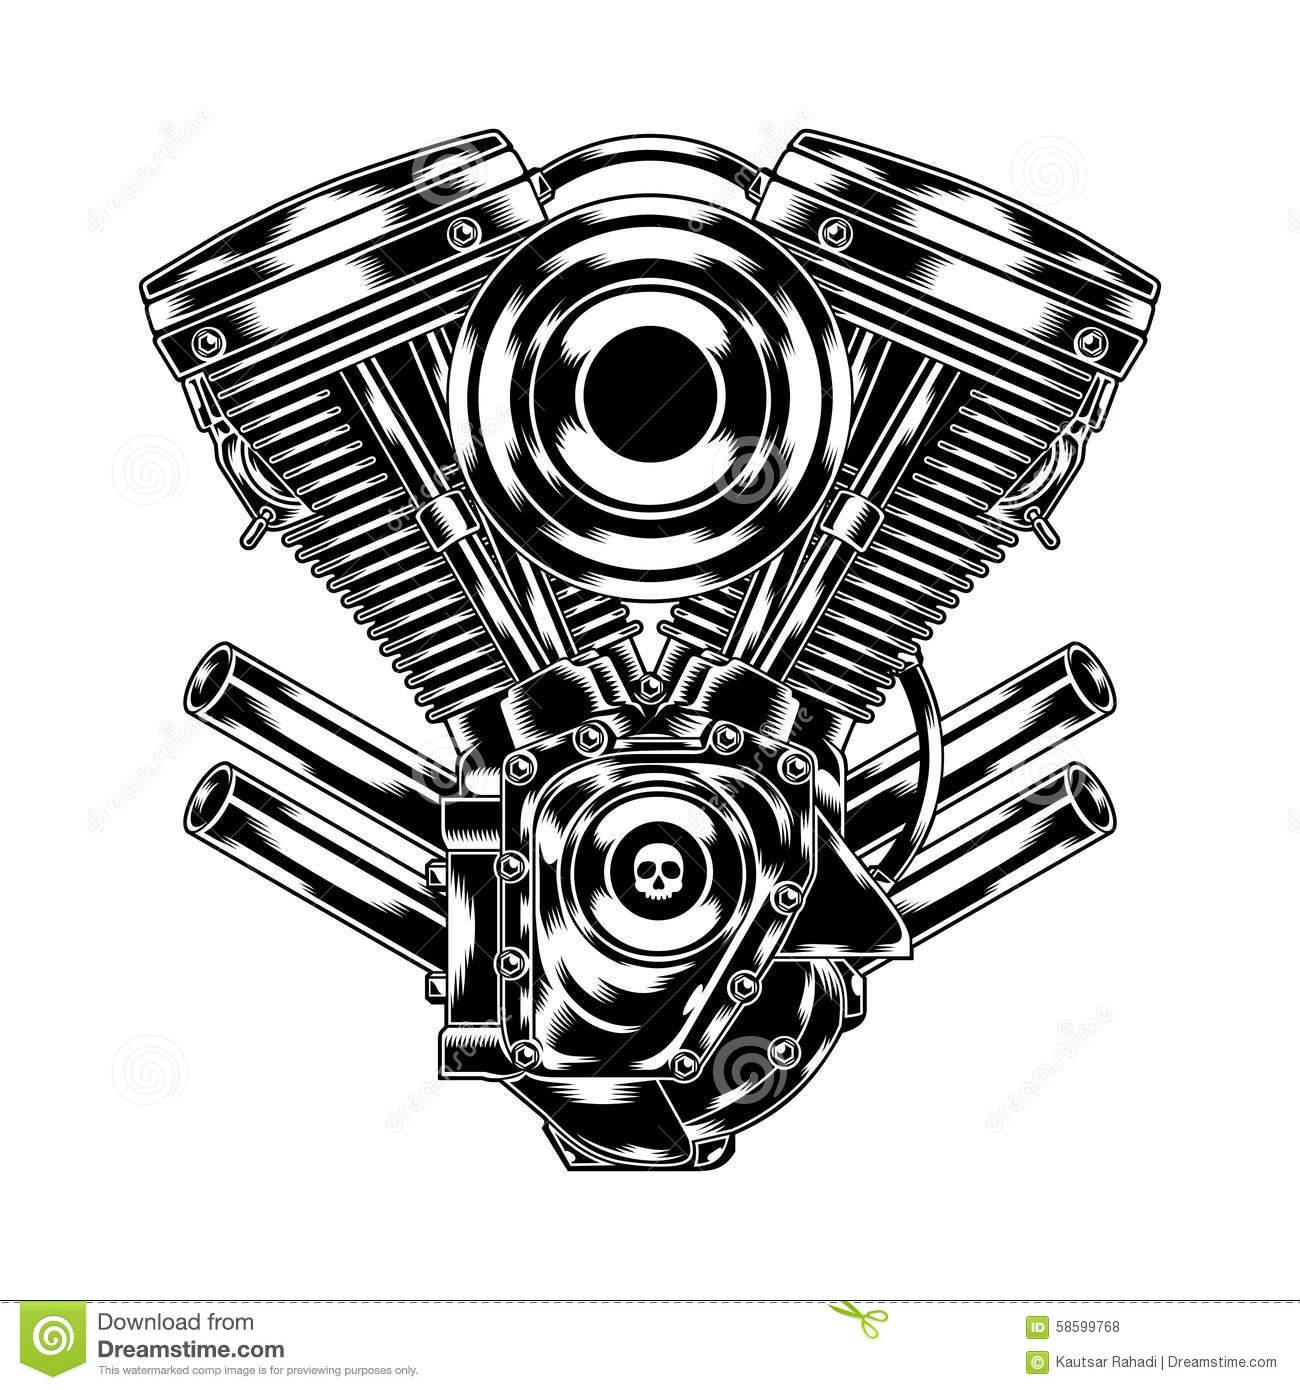 Engine clipart motorbike Panda Engine Clipart Free Images